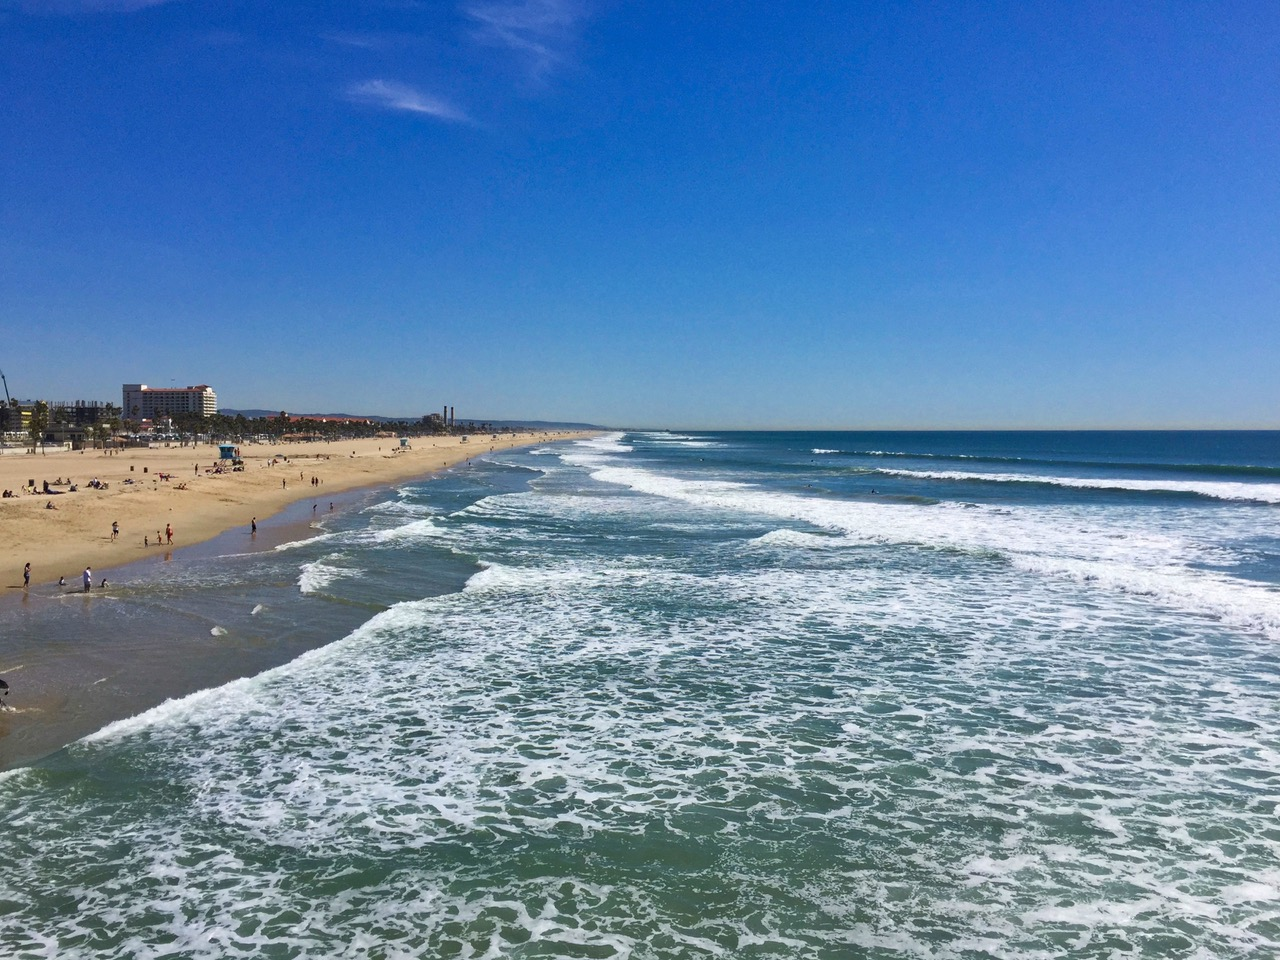 Catching waves at Huntington Beach, California